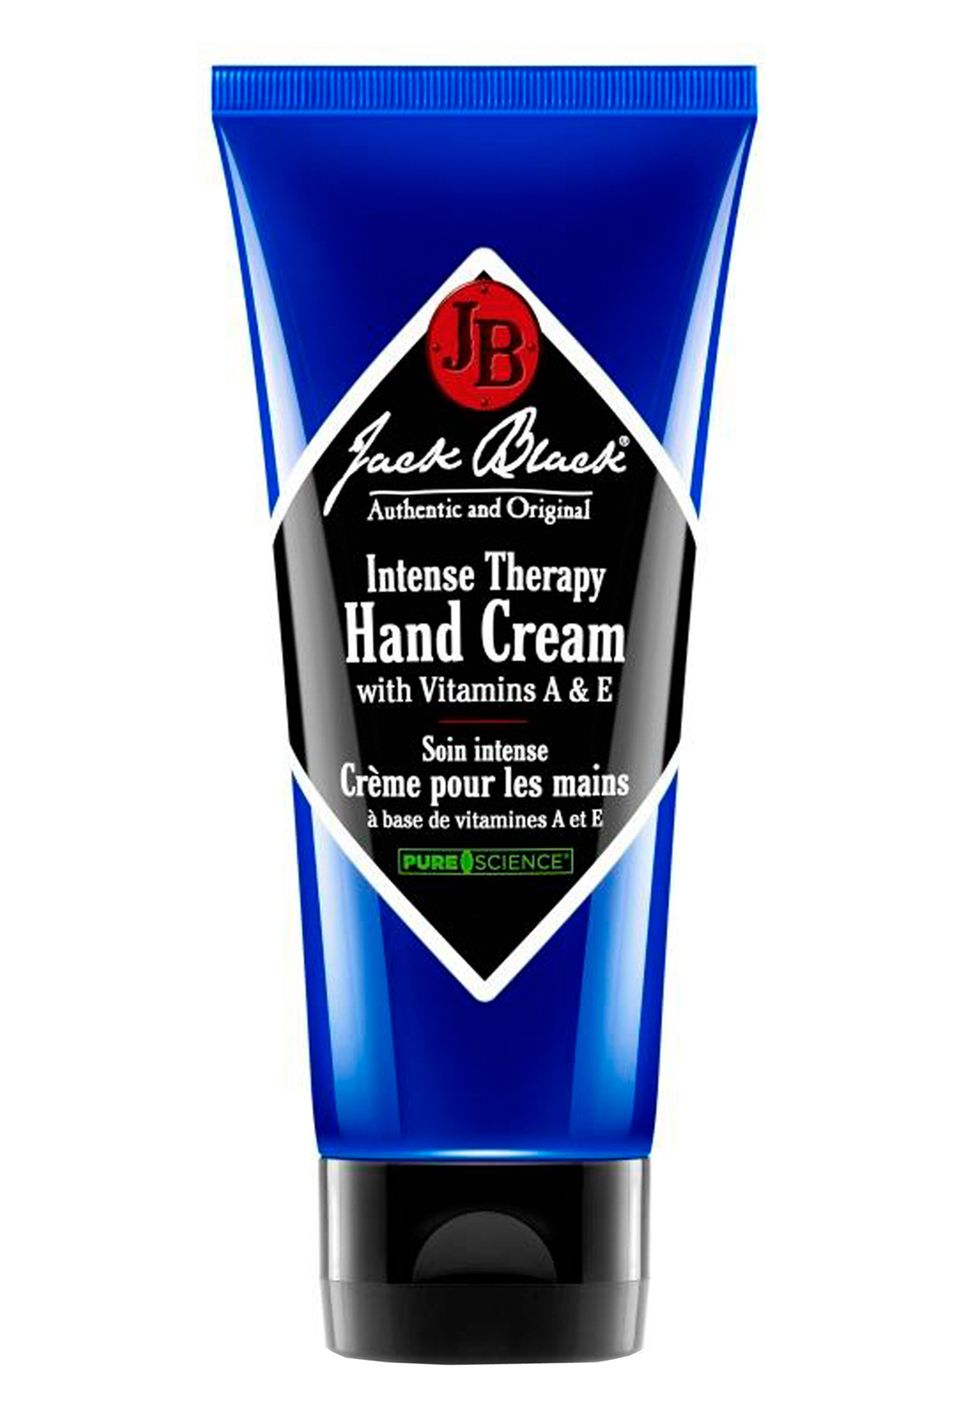 "Vitamin A und E reparieren rissige Haut: ""Intense Therapy Hand Cream"" von Jack Black, 88 ml, ca. 17 Euro"